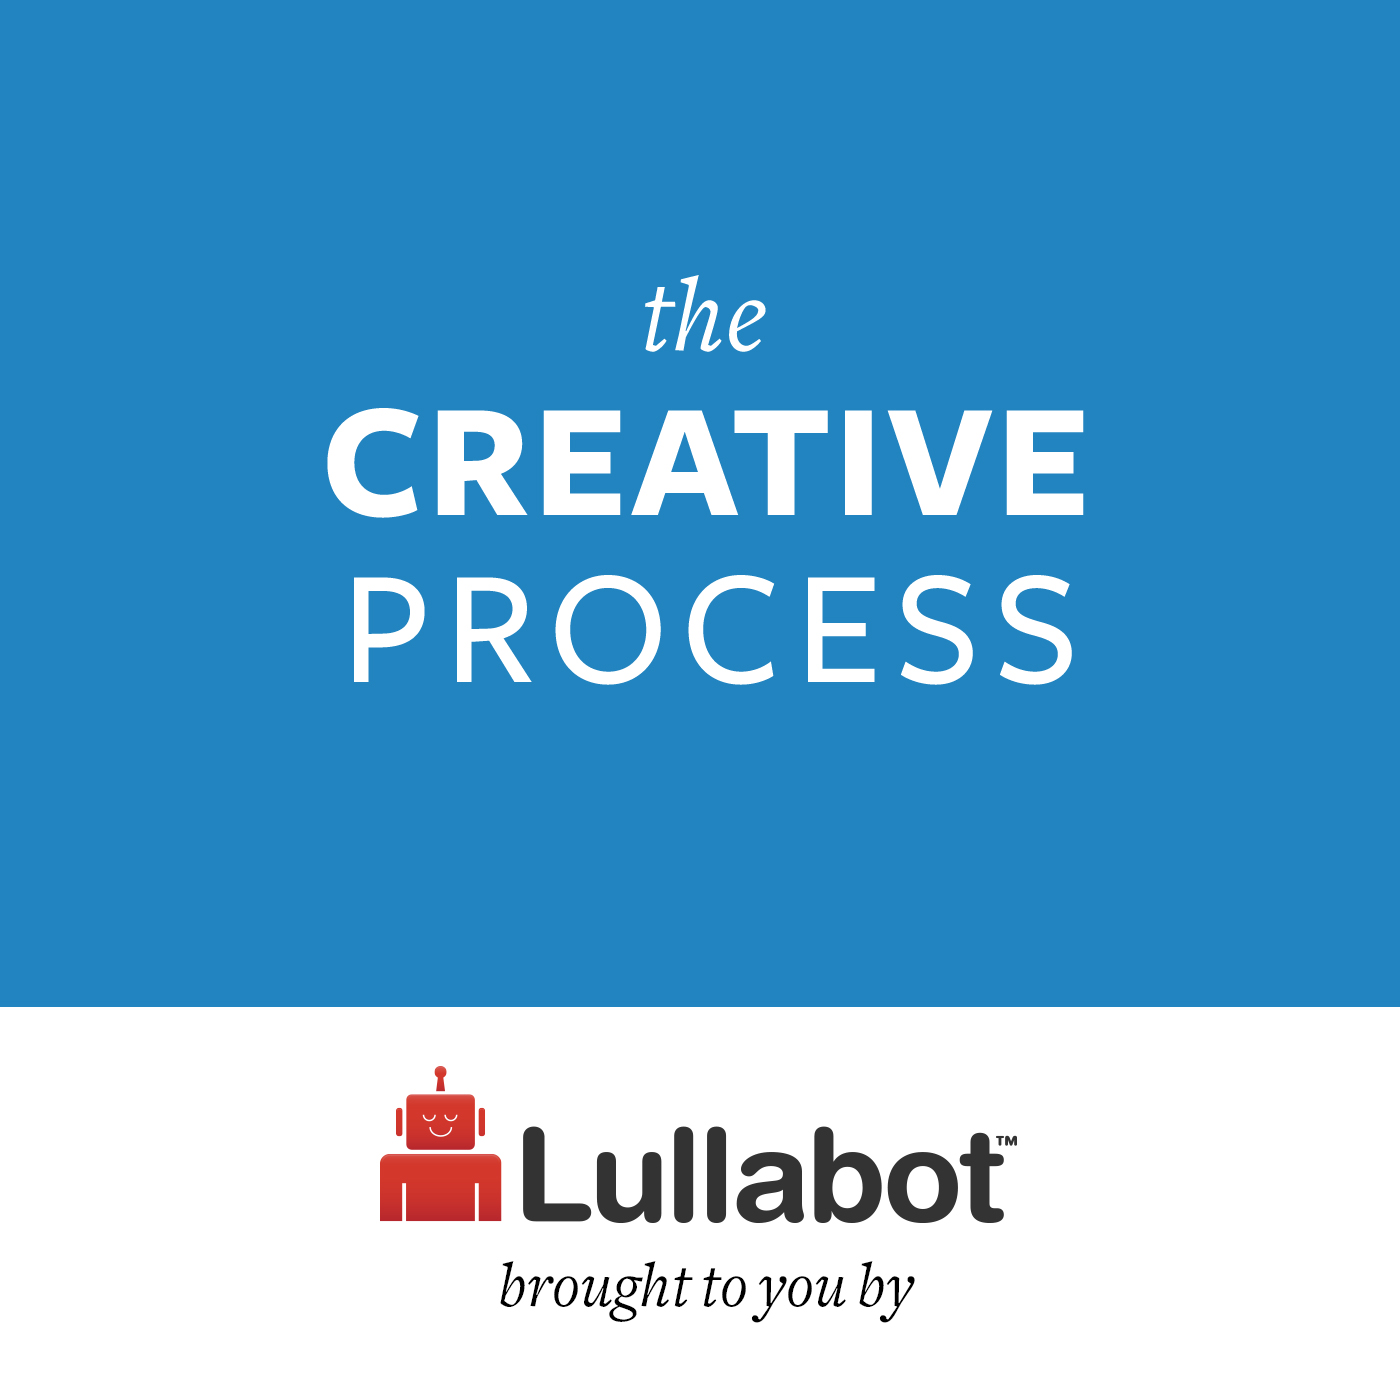 <![CDATA[The Creative Process]]>